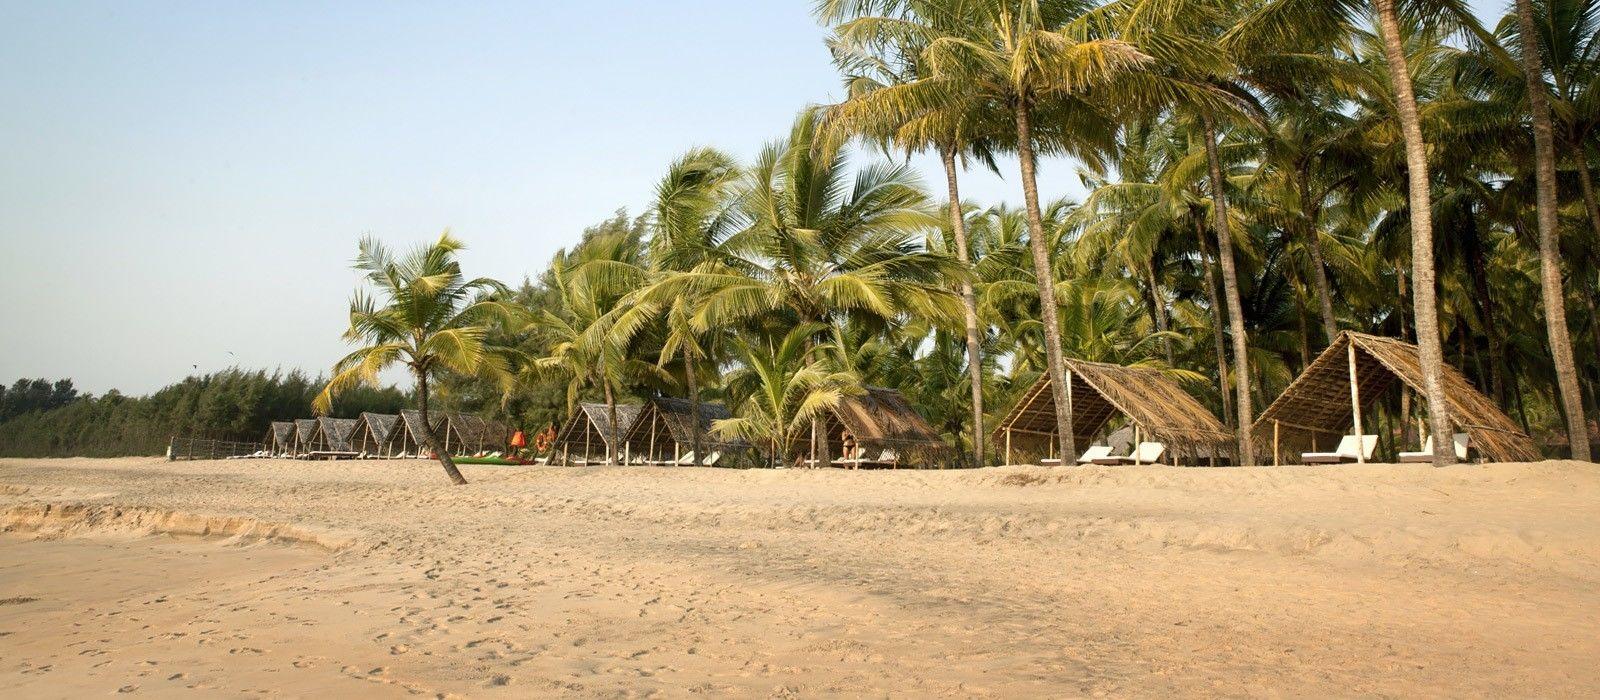 Ayurveda Reise: Erholung pur in Kerala Urlaub 3